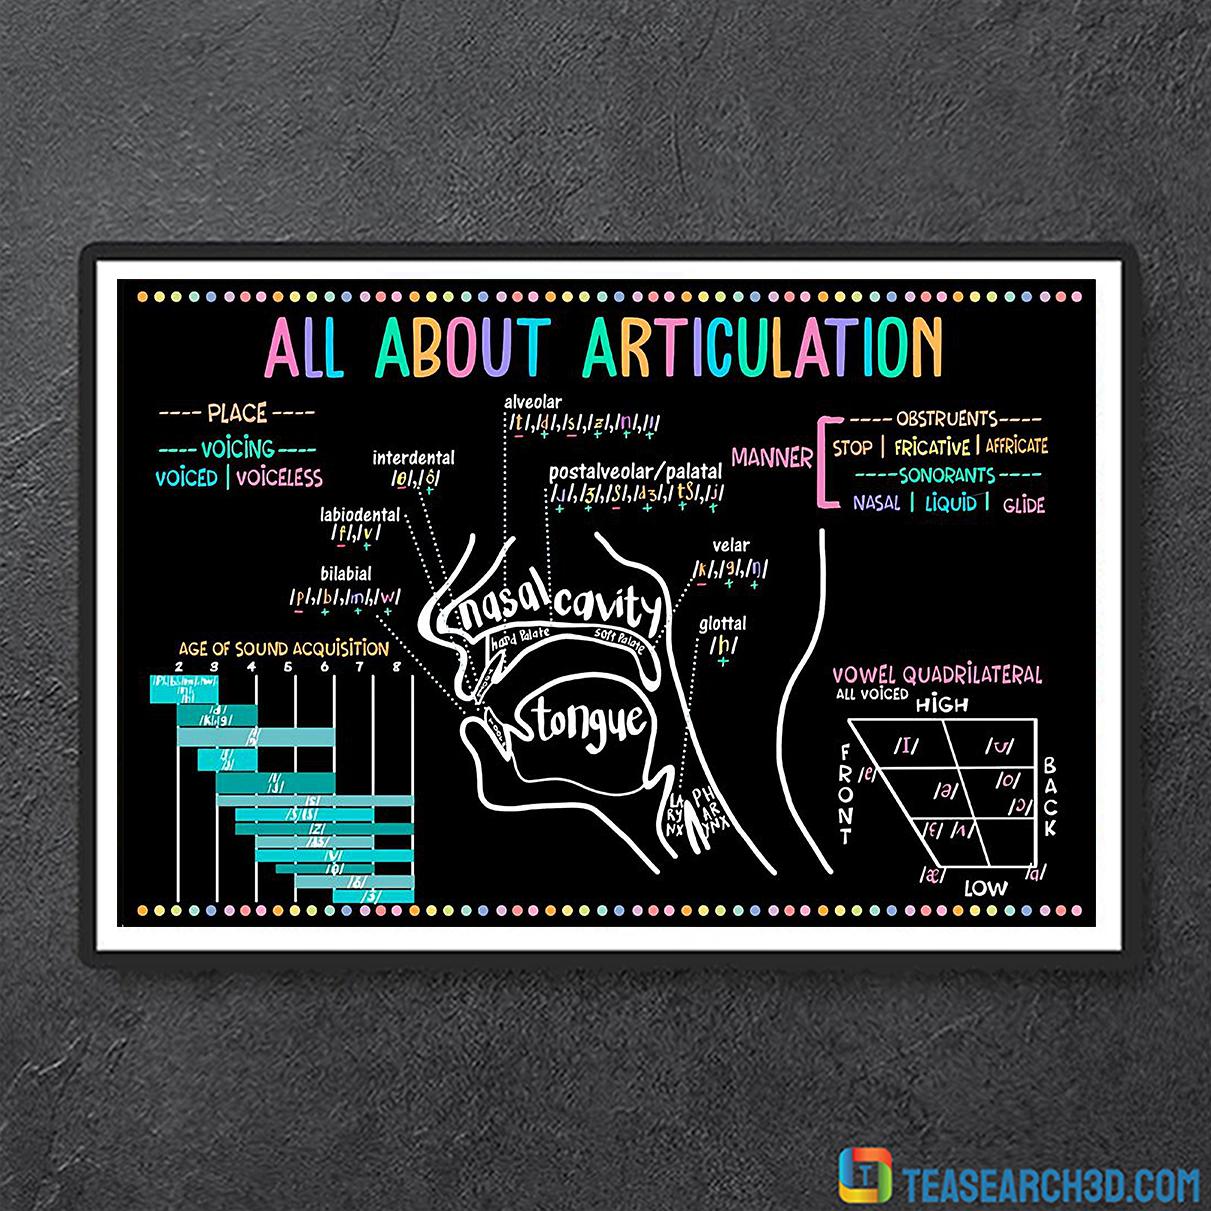 Speech language pathologist all about articulation poster A2